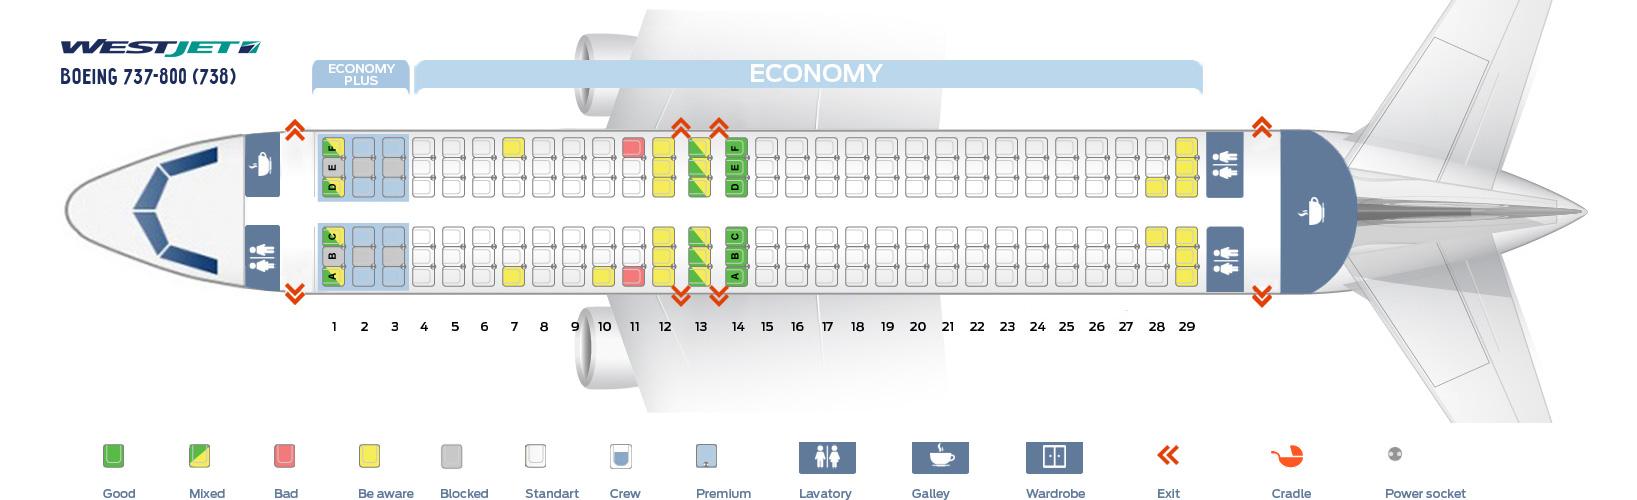 boeing 737 300 seating chart westjet brokeasshome